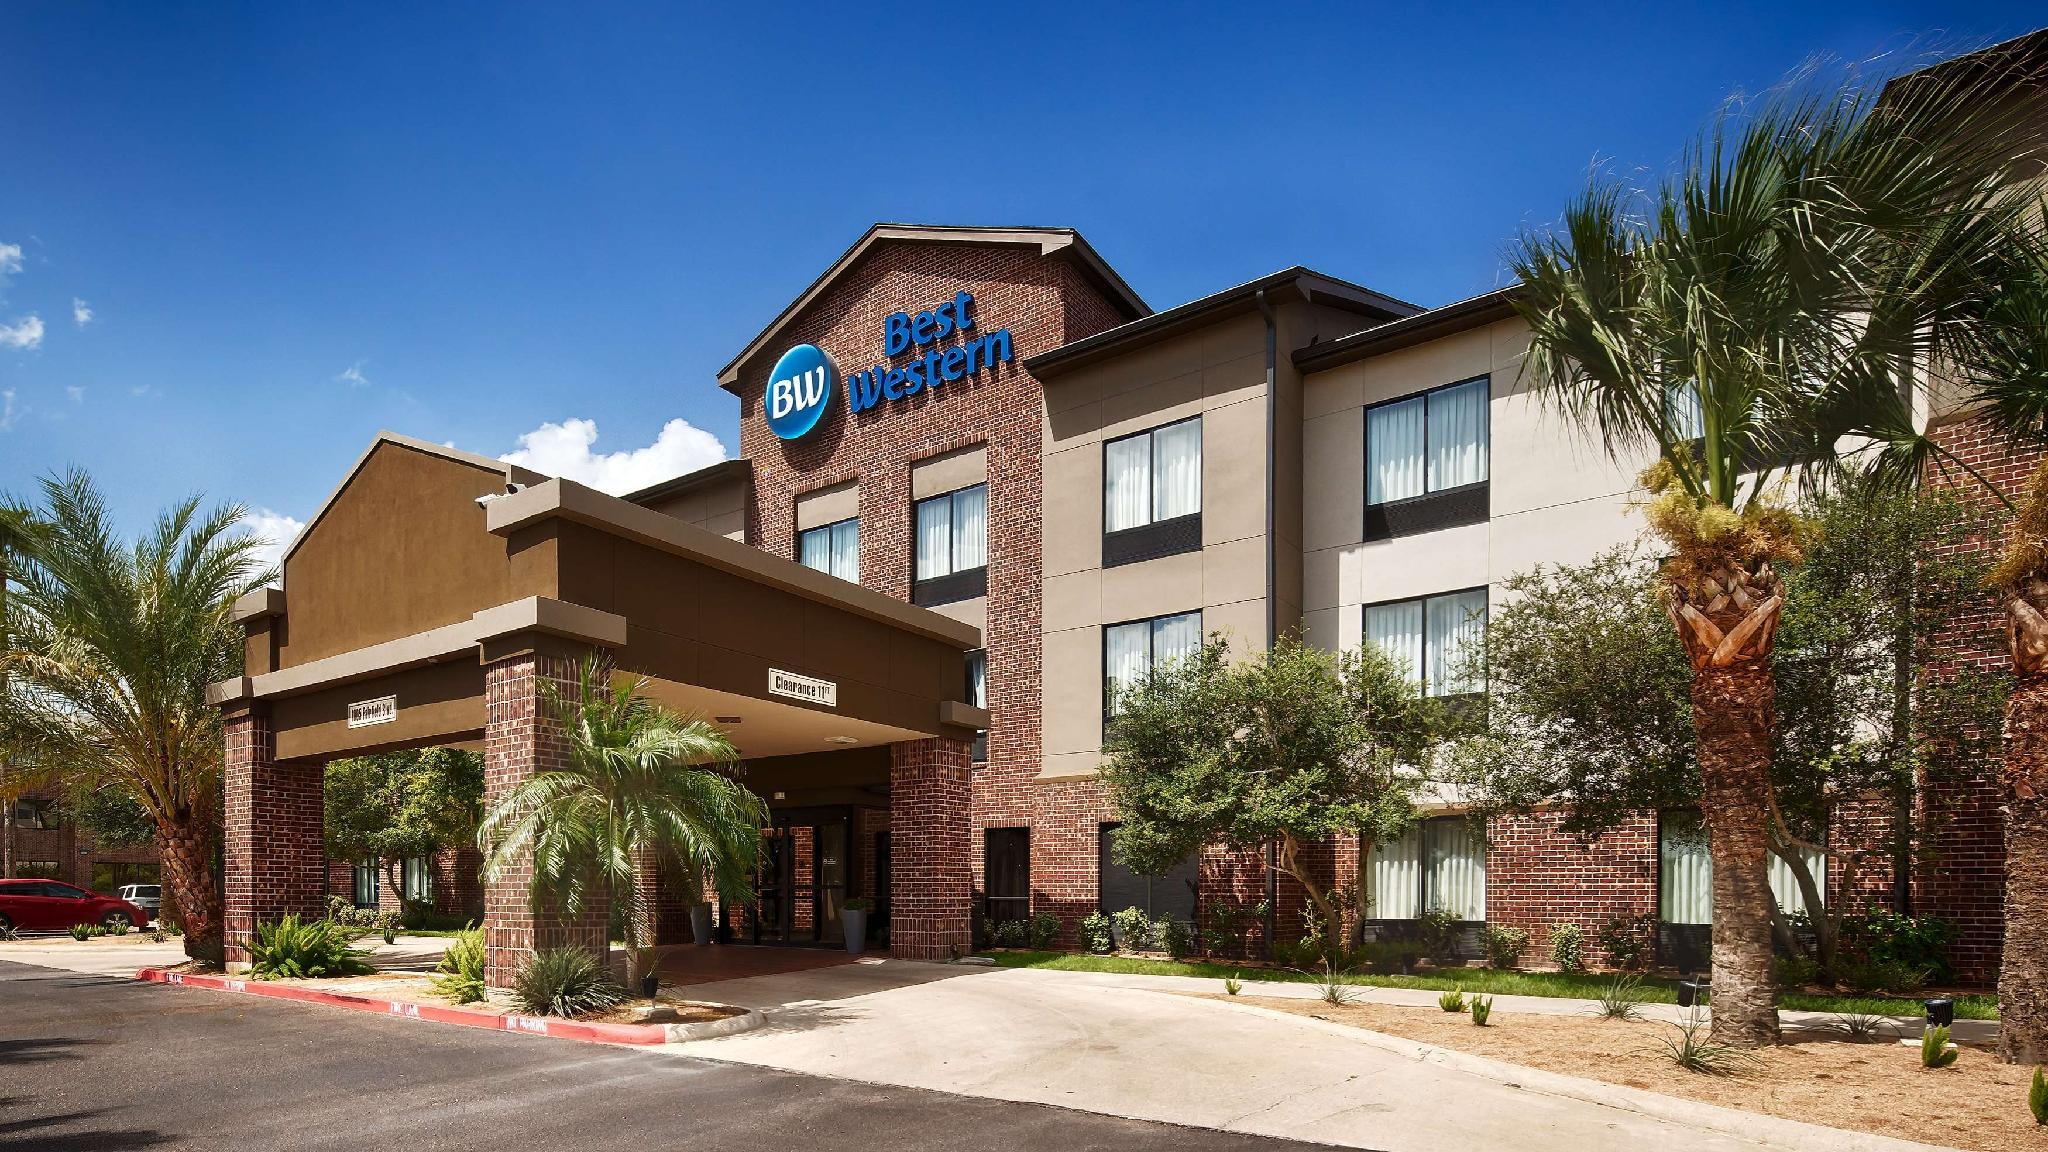 Best Western Town Center Inn, Hidalgo